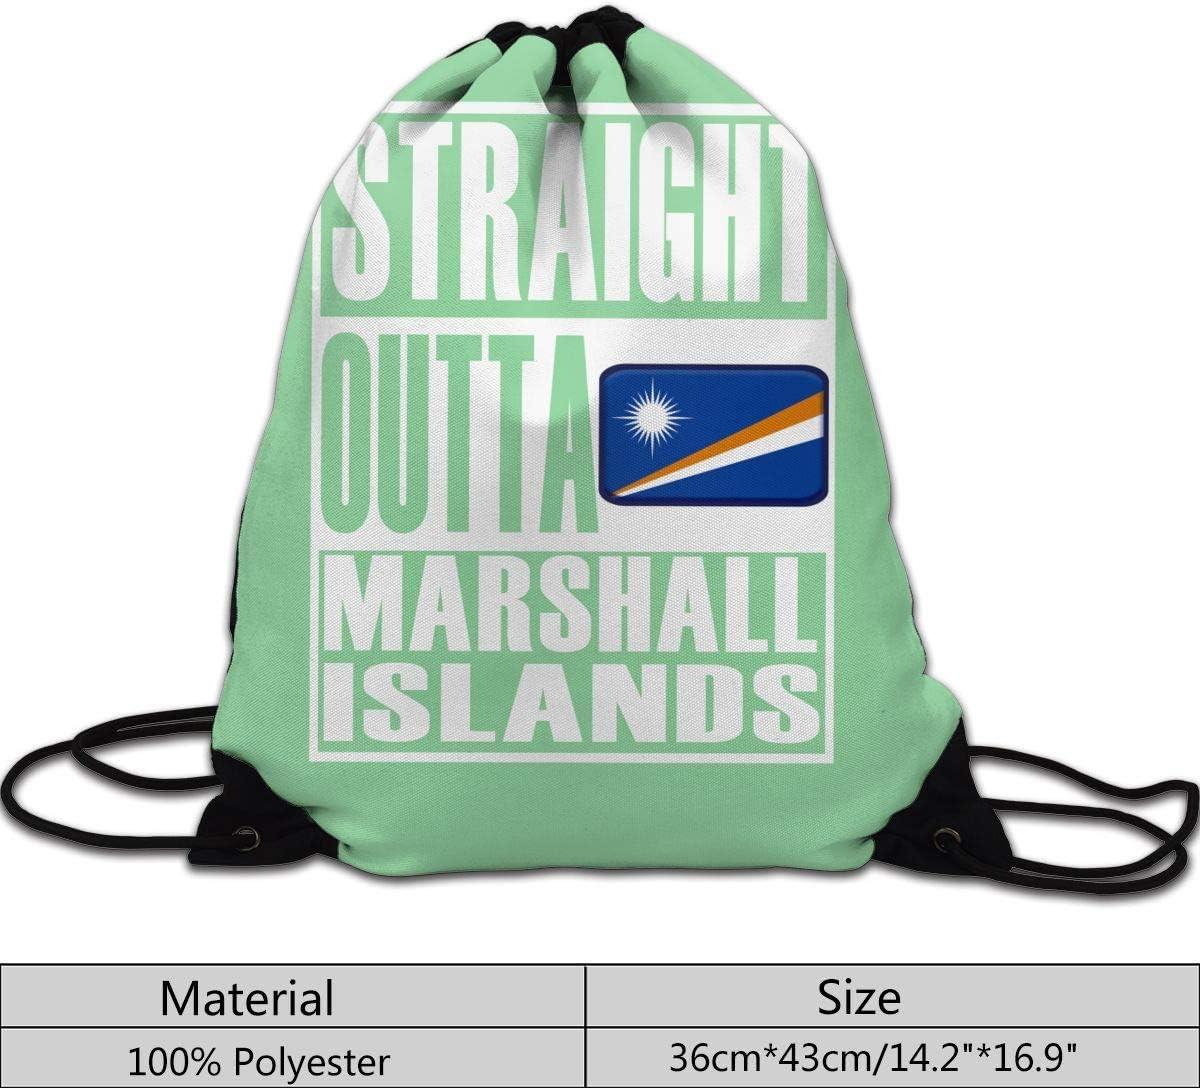 CKJL-YJ Straight Outta Marshall Islands Unisex Drawstring Backpacks Sport Leisure Bag